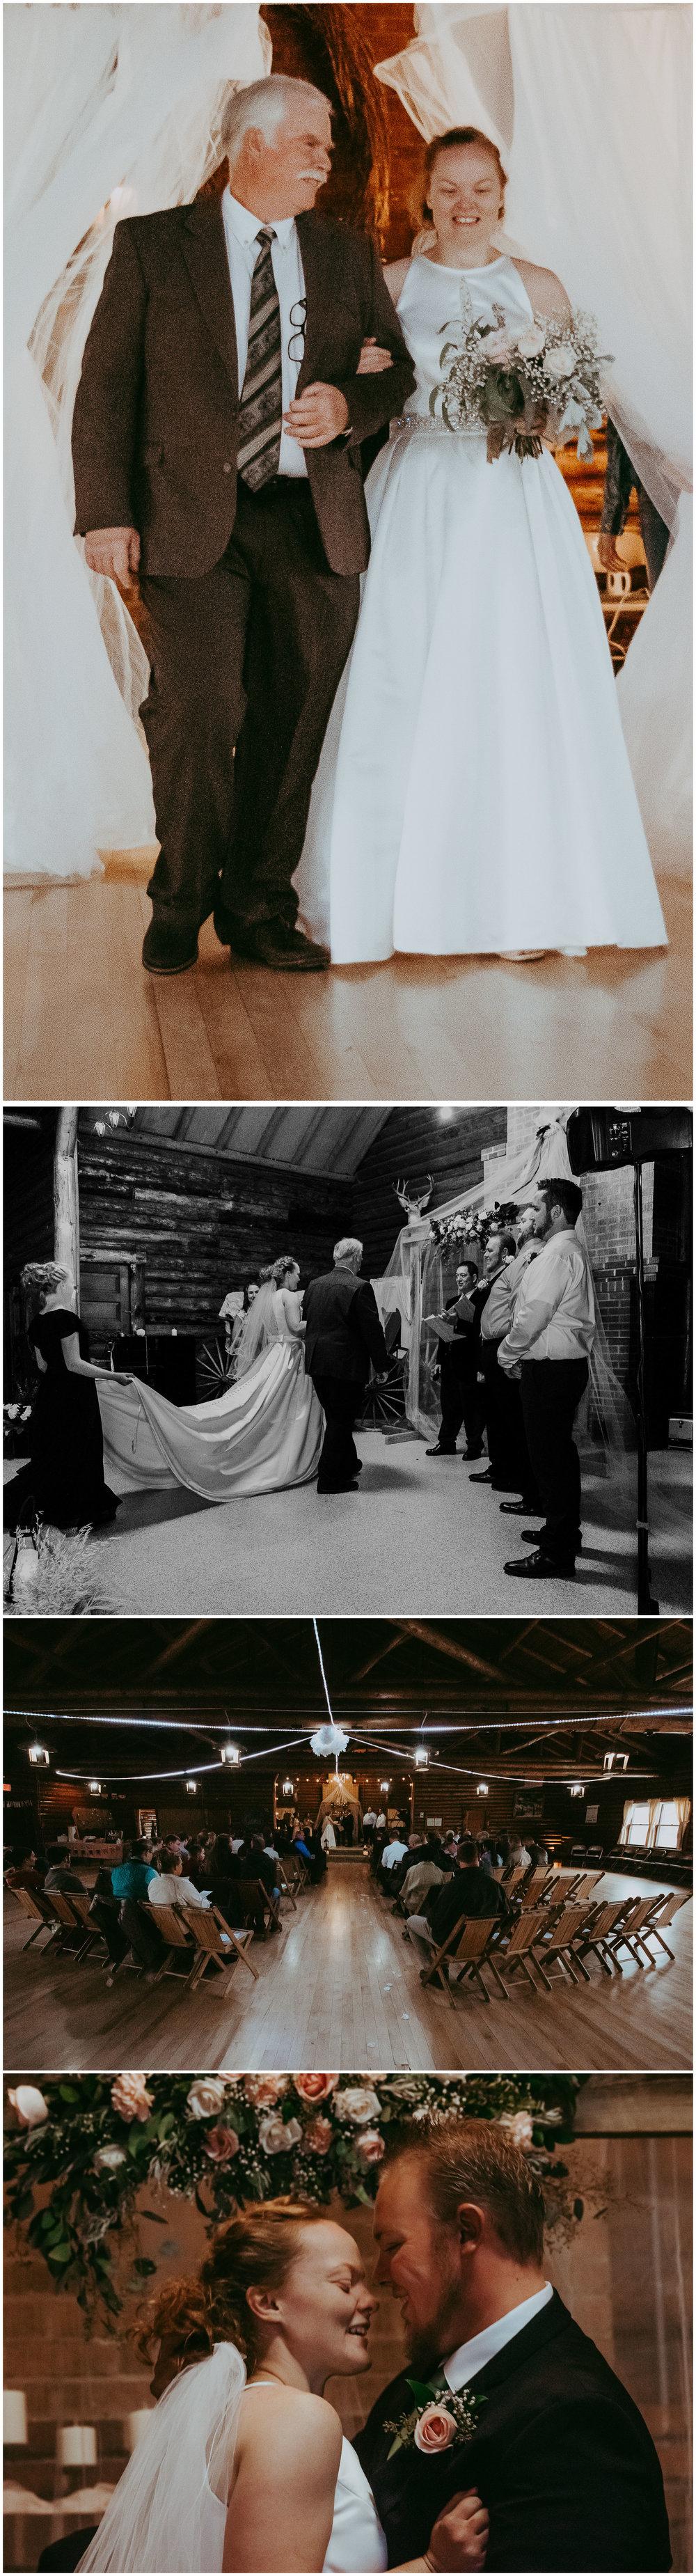 Chet and Angela wedding. Sagebrush Studio Photography, Montana.